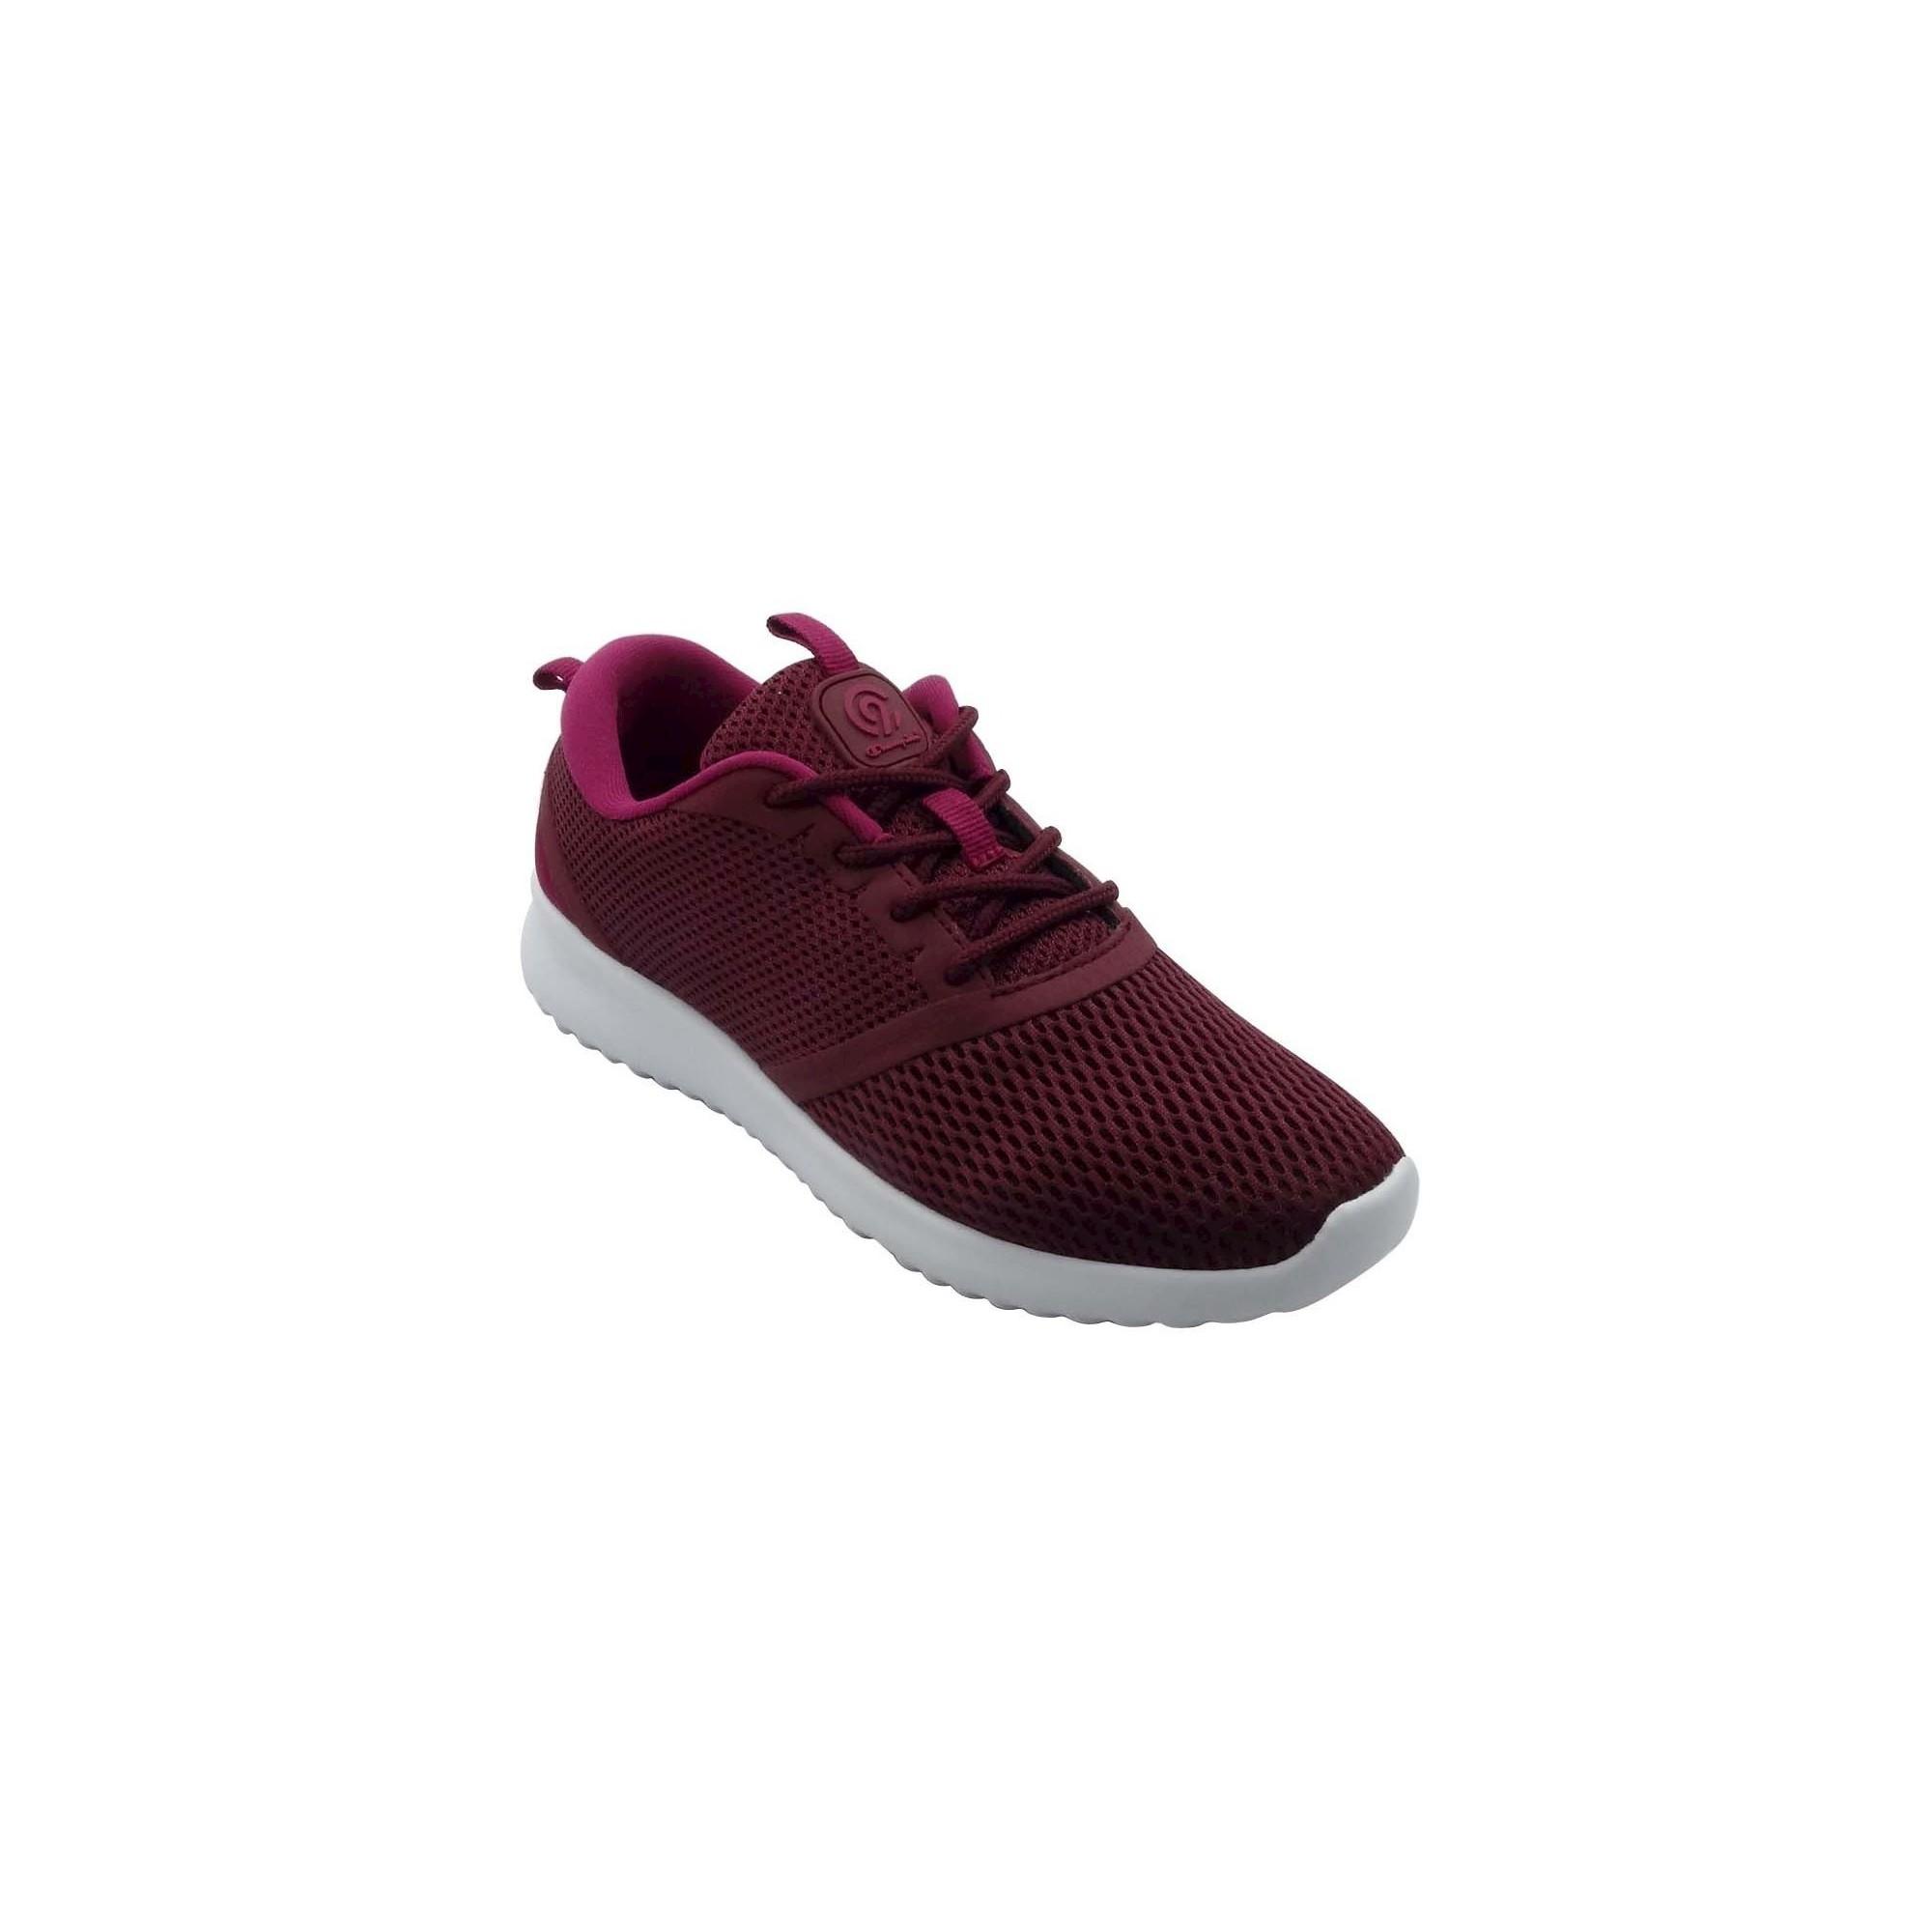 92827f54f13 Women s Limit 2.0 Performance Athletic Shoes - C9 Champion Burgundy ...